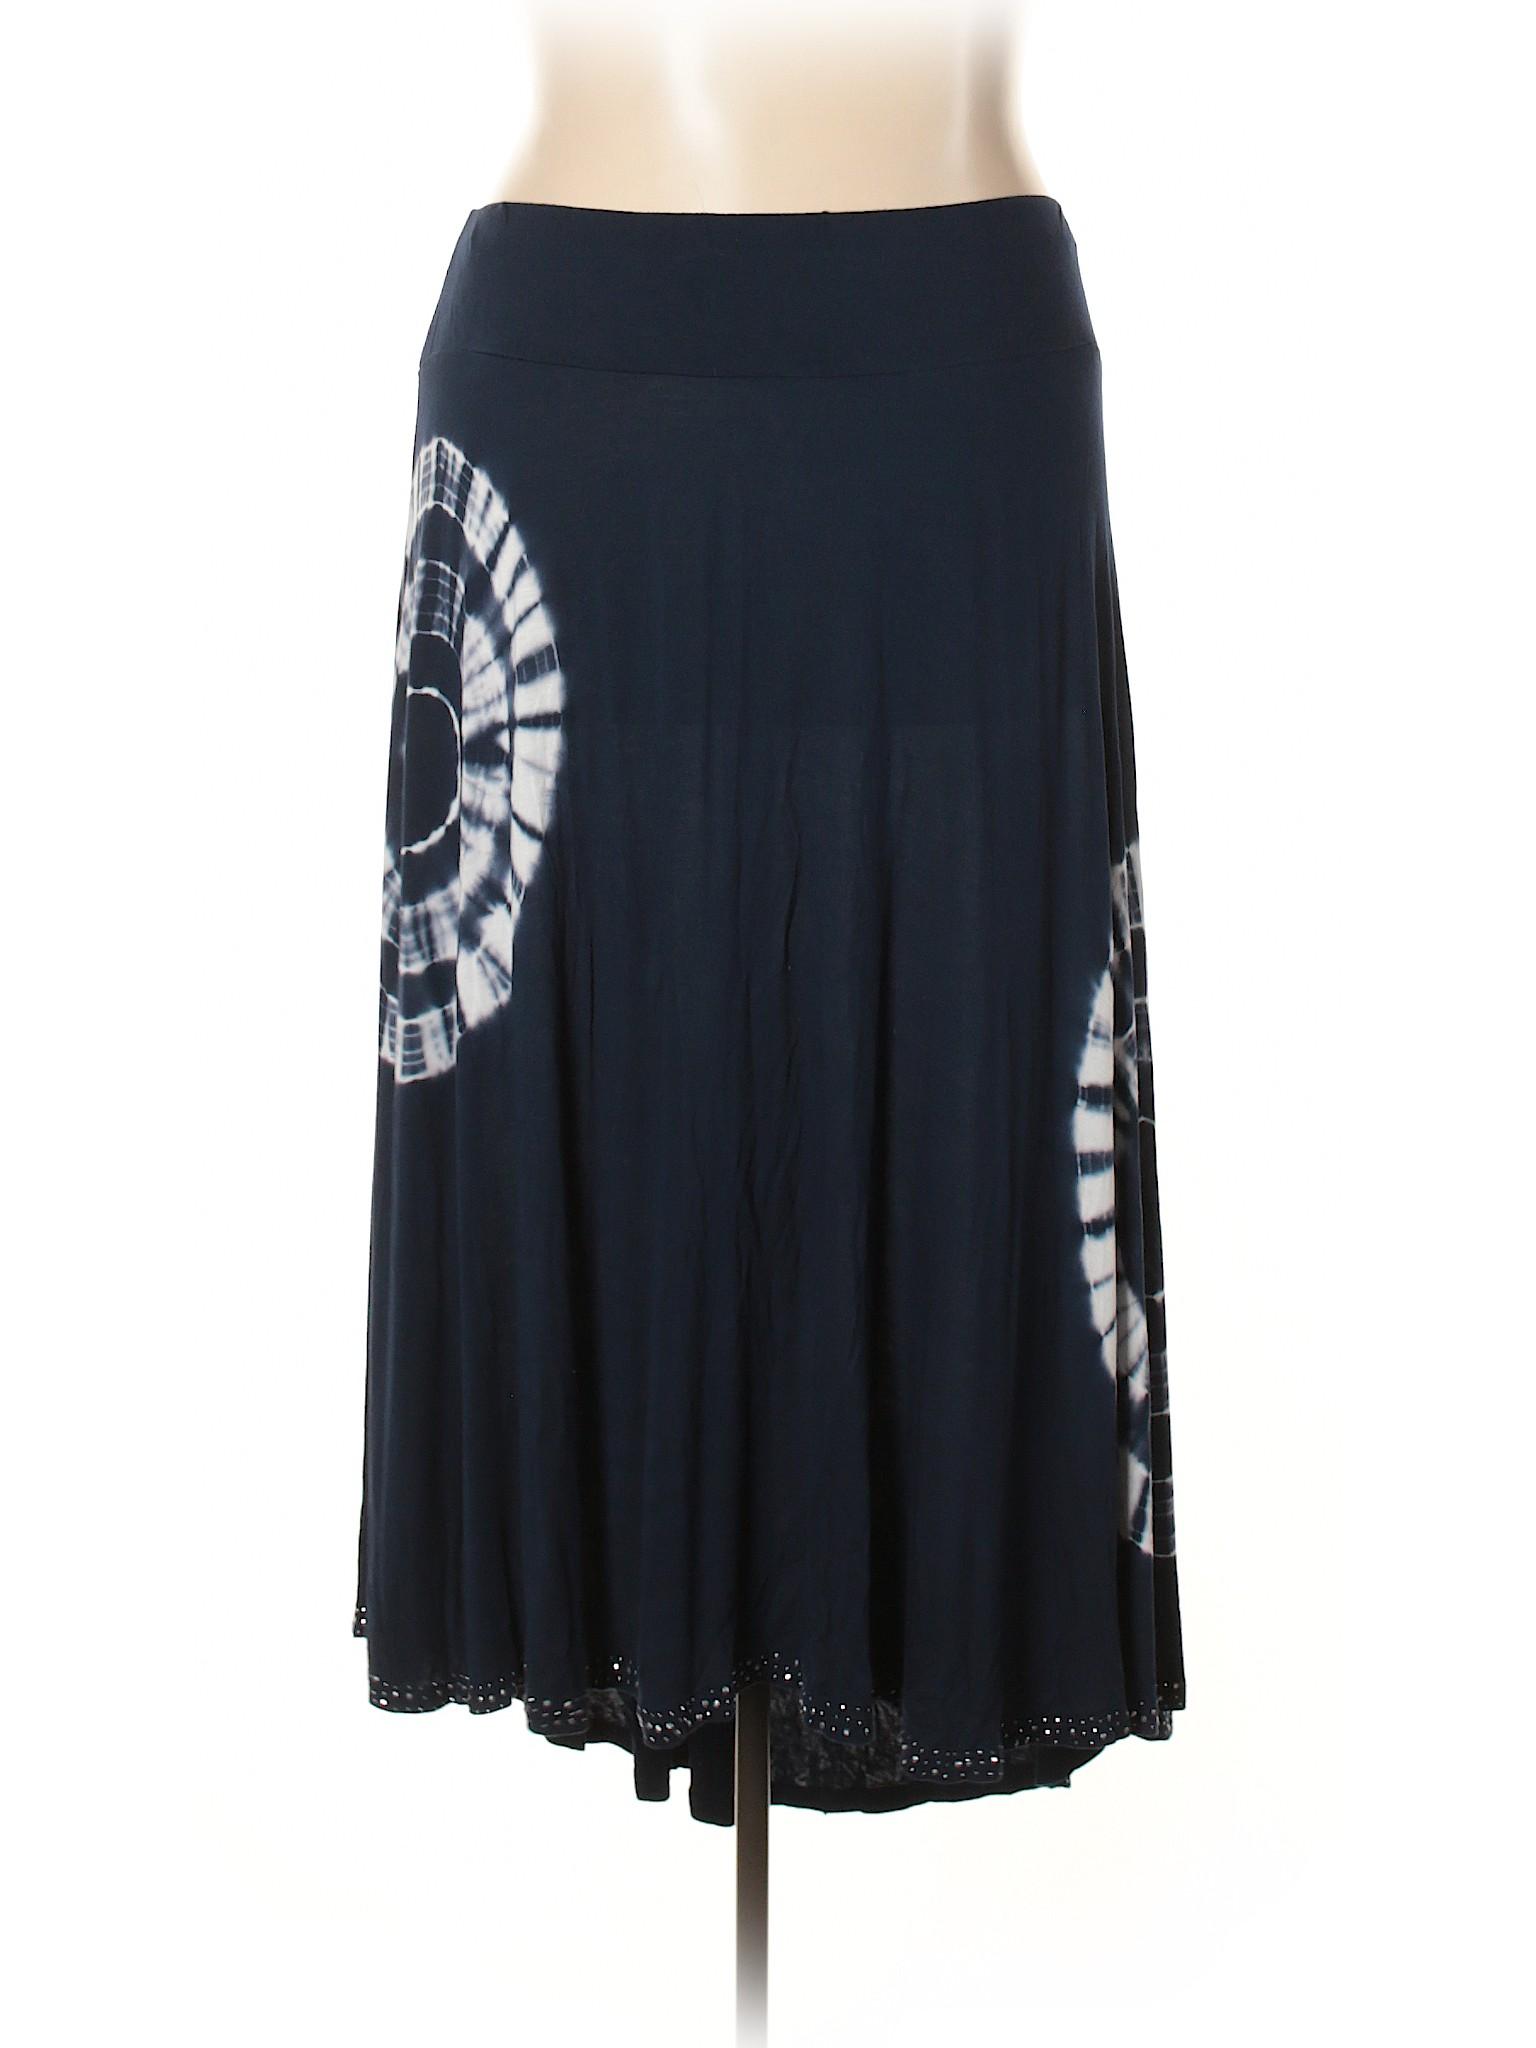 Skirt Casual Boutique Casual Skirt Casual Boutique Boutique Skirt Skirt Boutique Casual f07cgqCWw4